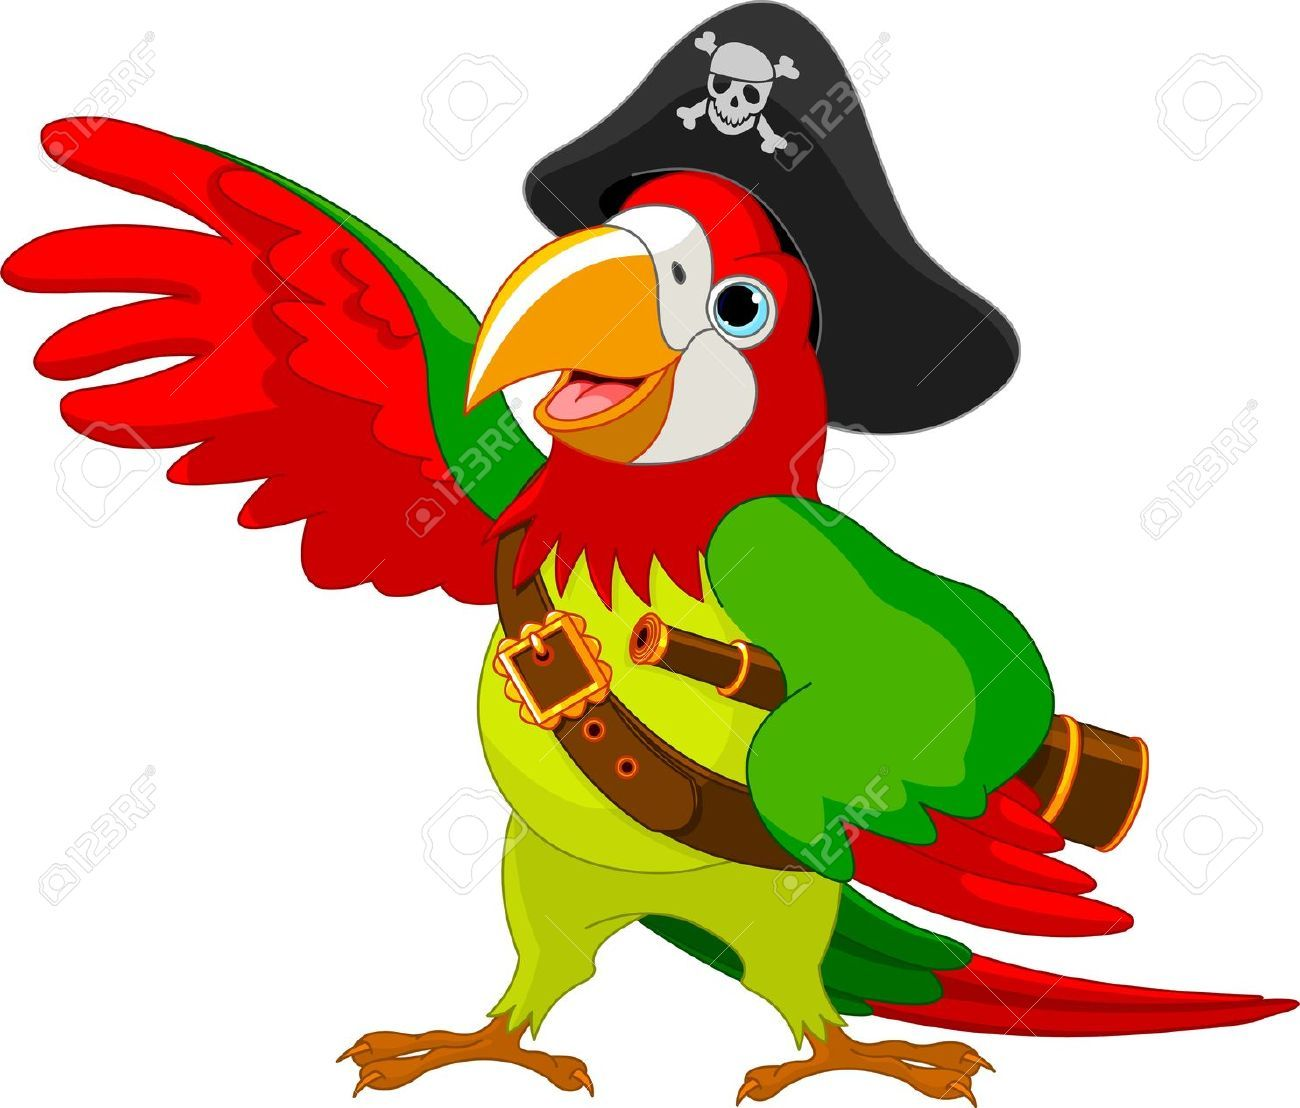 Perroquet pirate dessin recherche google spectacle - Perroquet dessin ...